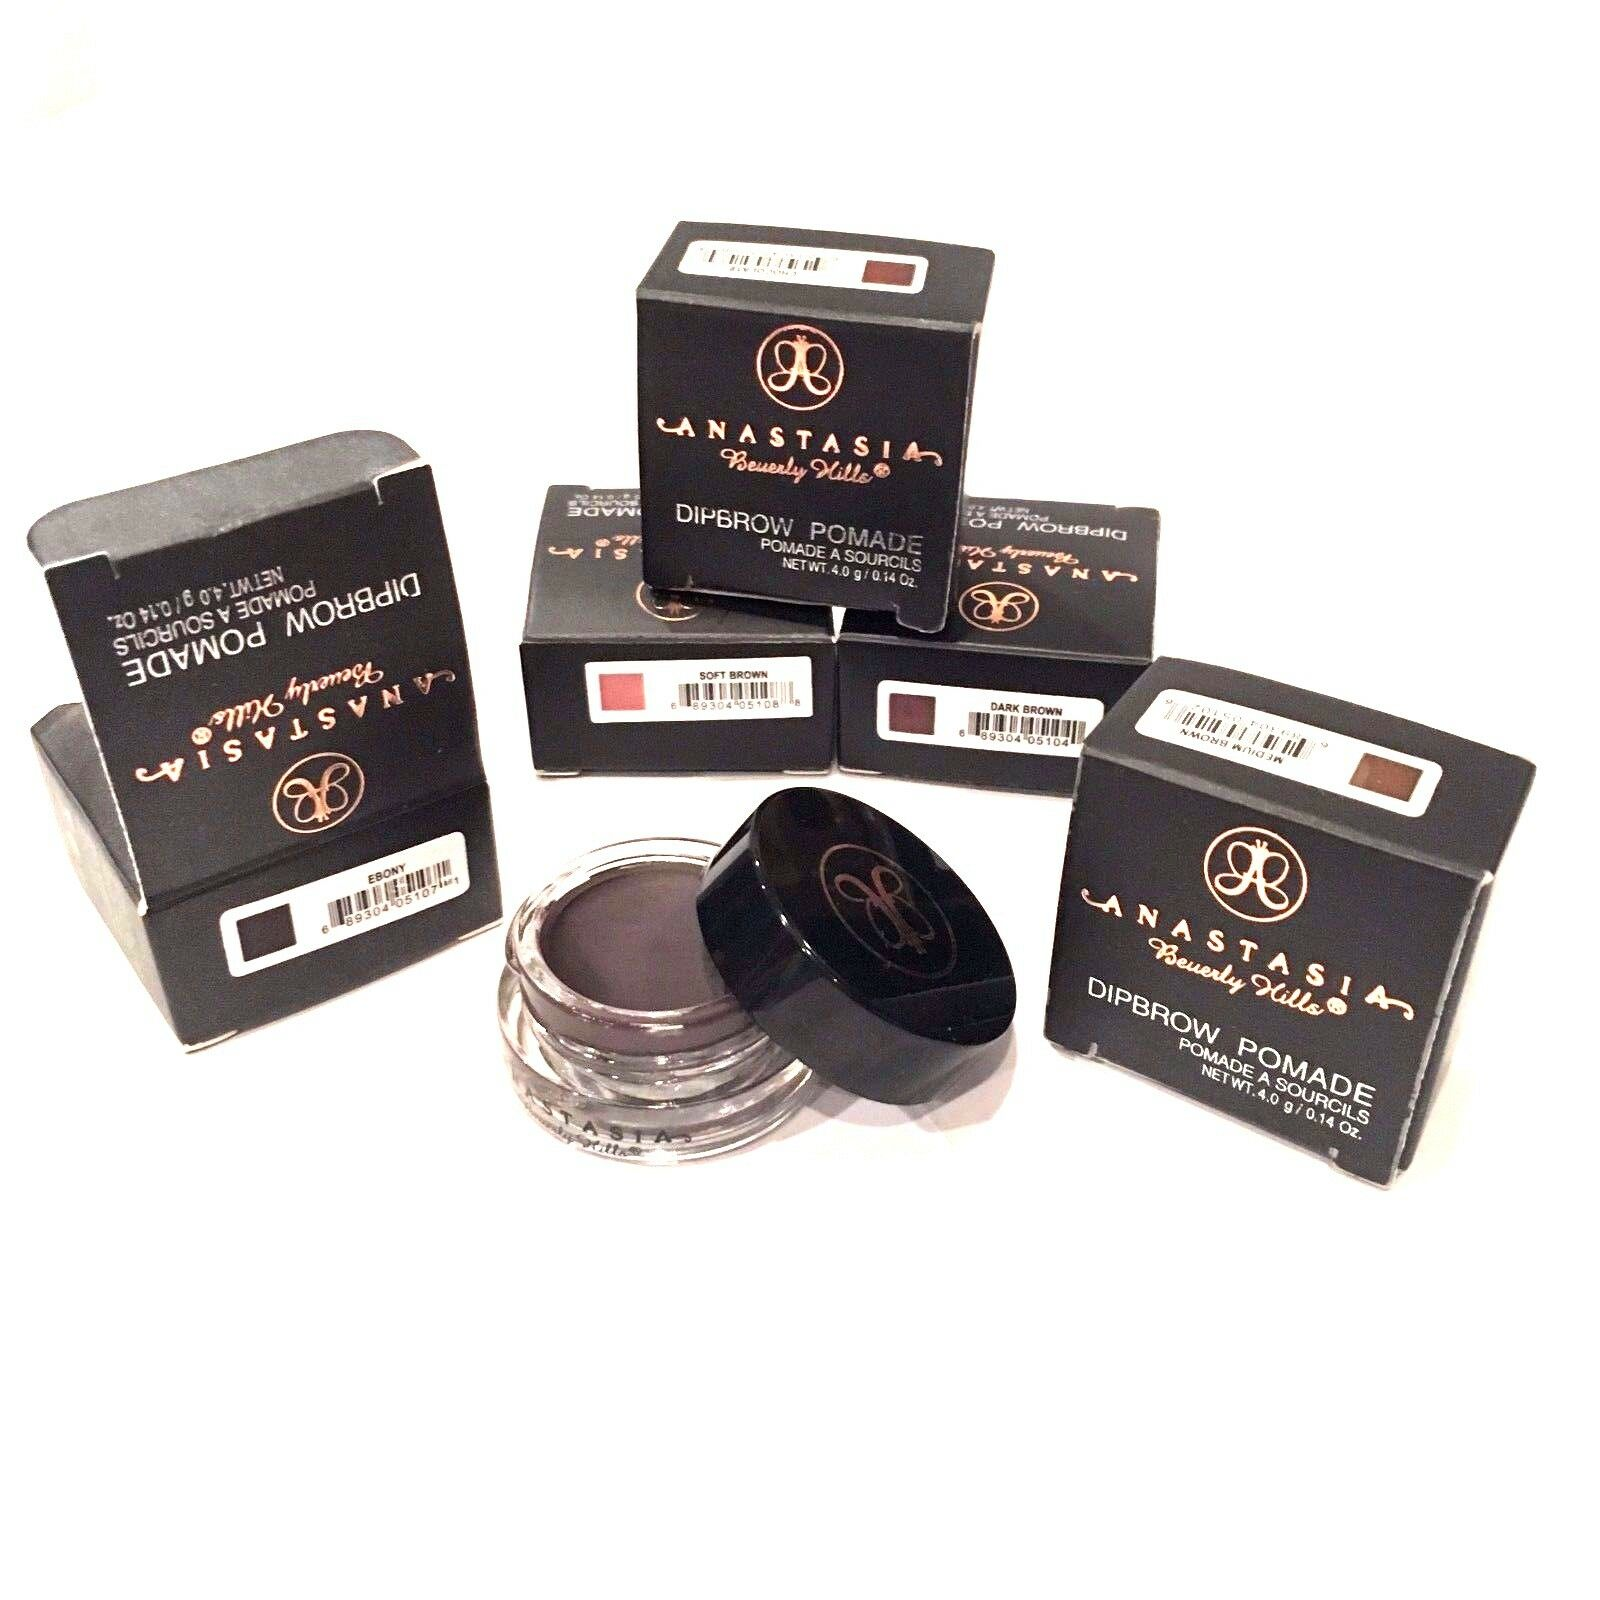 Anastasia Beverly Hills Dipbrow Pomade Eyebrows In Health Kleancolor Brow Ebony Chocolate Tweezers New